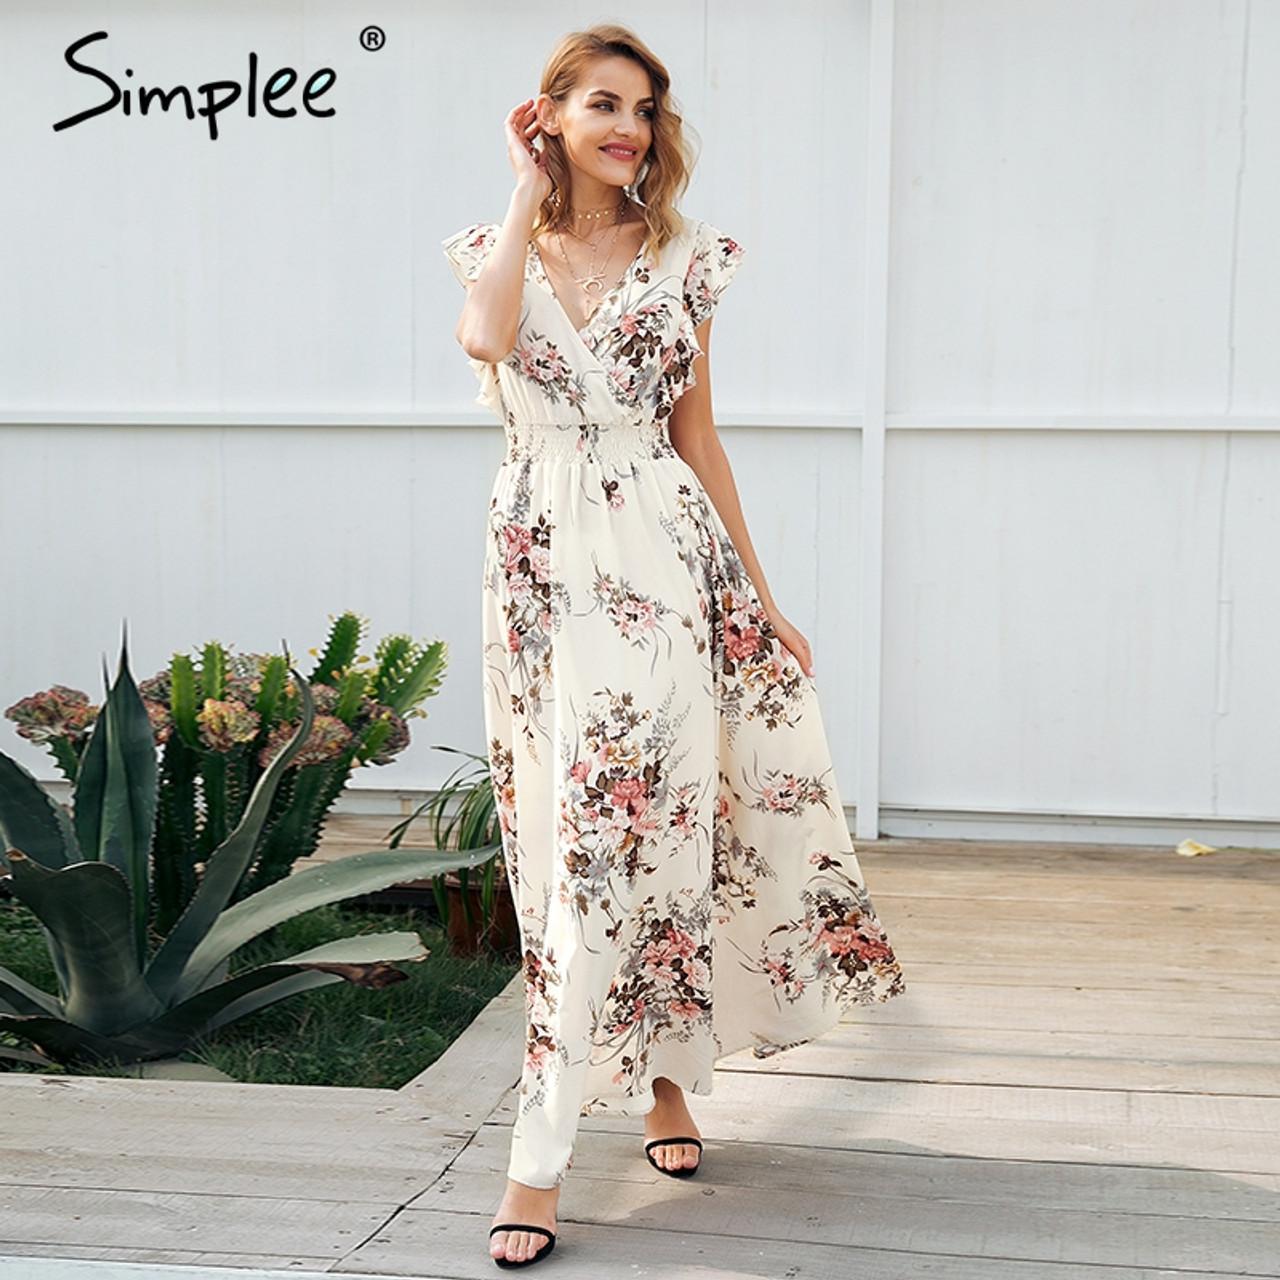 1b70251f9a Simplee Ruffle backless bow print long dress Women v neck tie up summer  dress female Casual beach chic boho maxi dress vestidos - OnshopDeals.Com